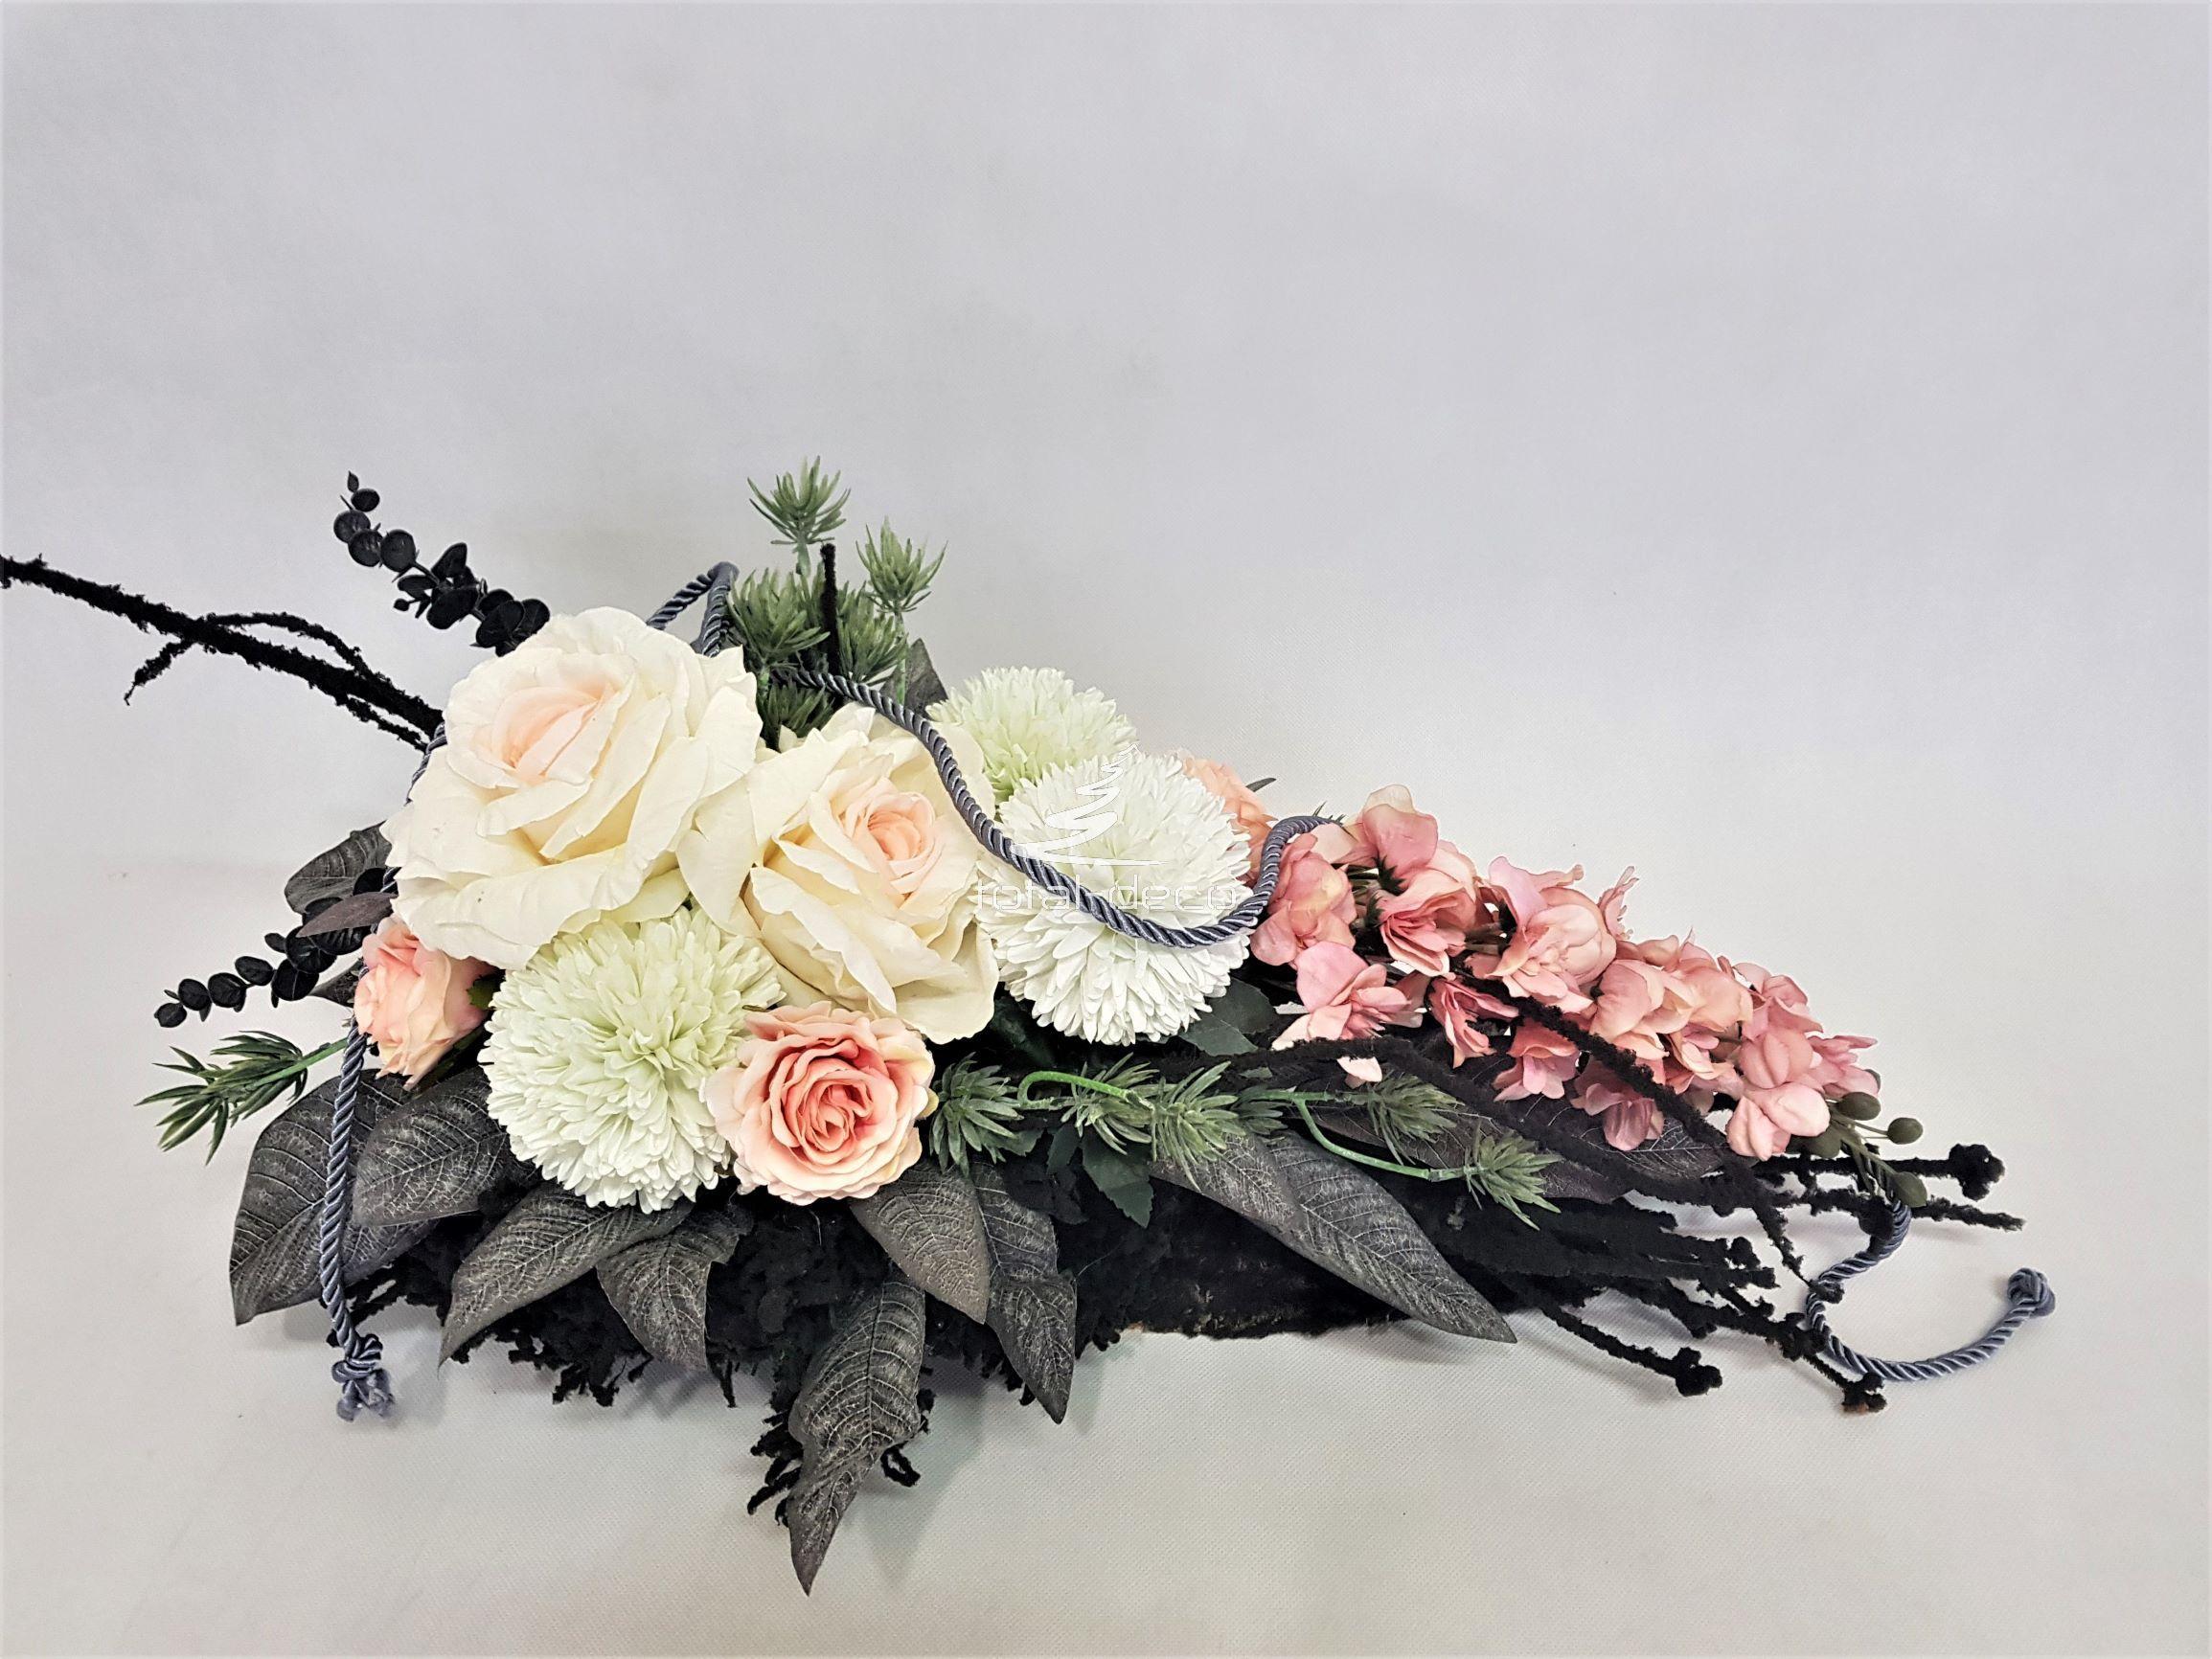 Piekna Kompozycja Nagrobna Stroiki Na Cmentarz Flower Arrangements Wreath Decor Floral Wreath